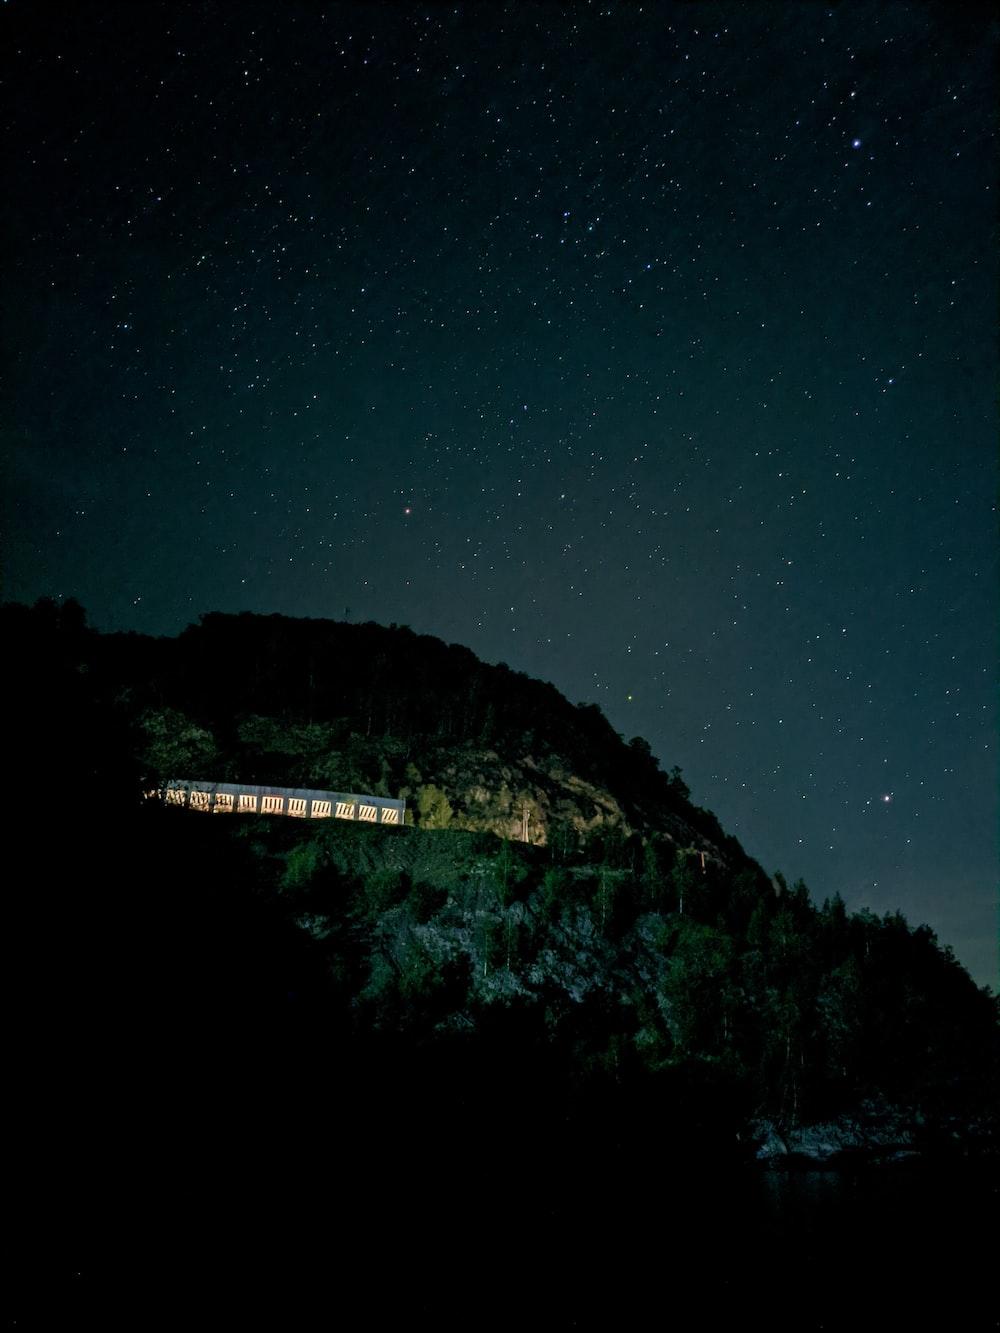 white bridge on top of mountain during night time